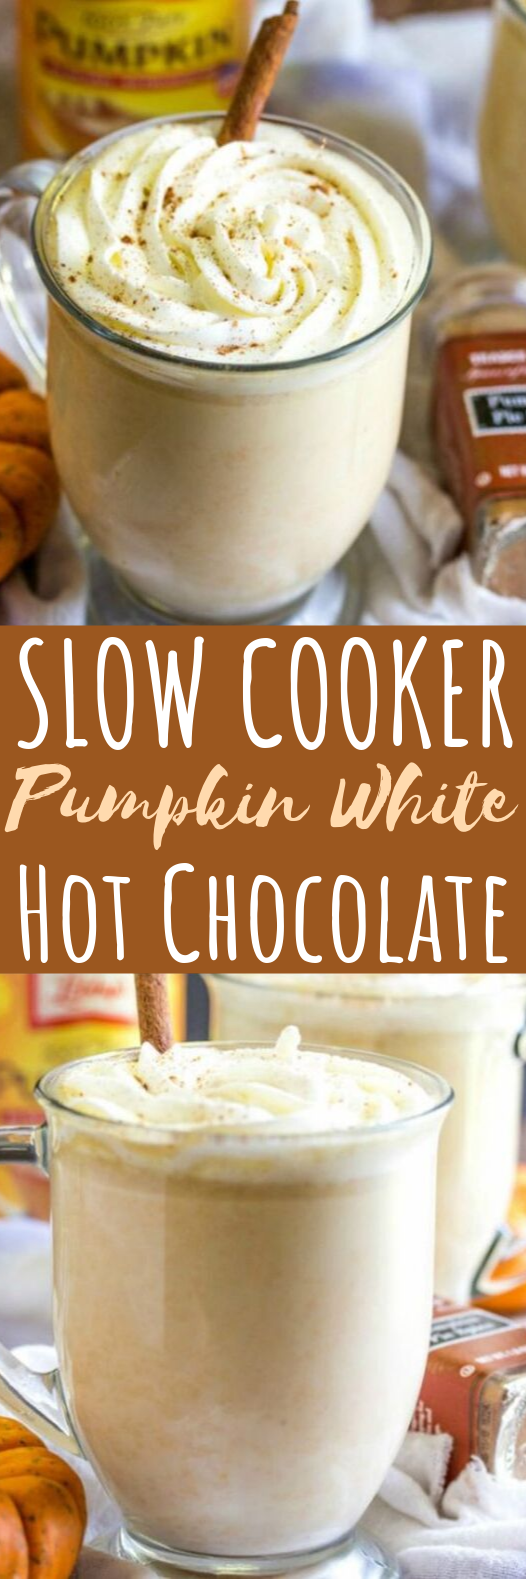 Slow Cooker Pumpkin White Hot Chocolate #drinks #hotchocolate